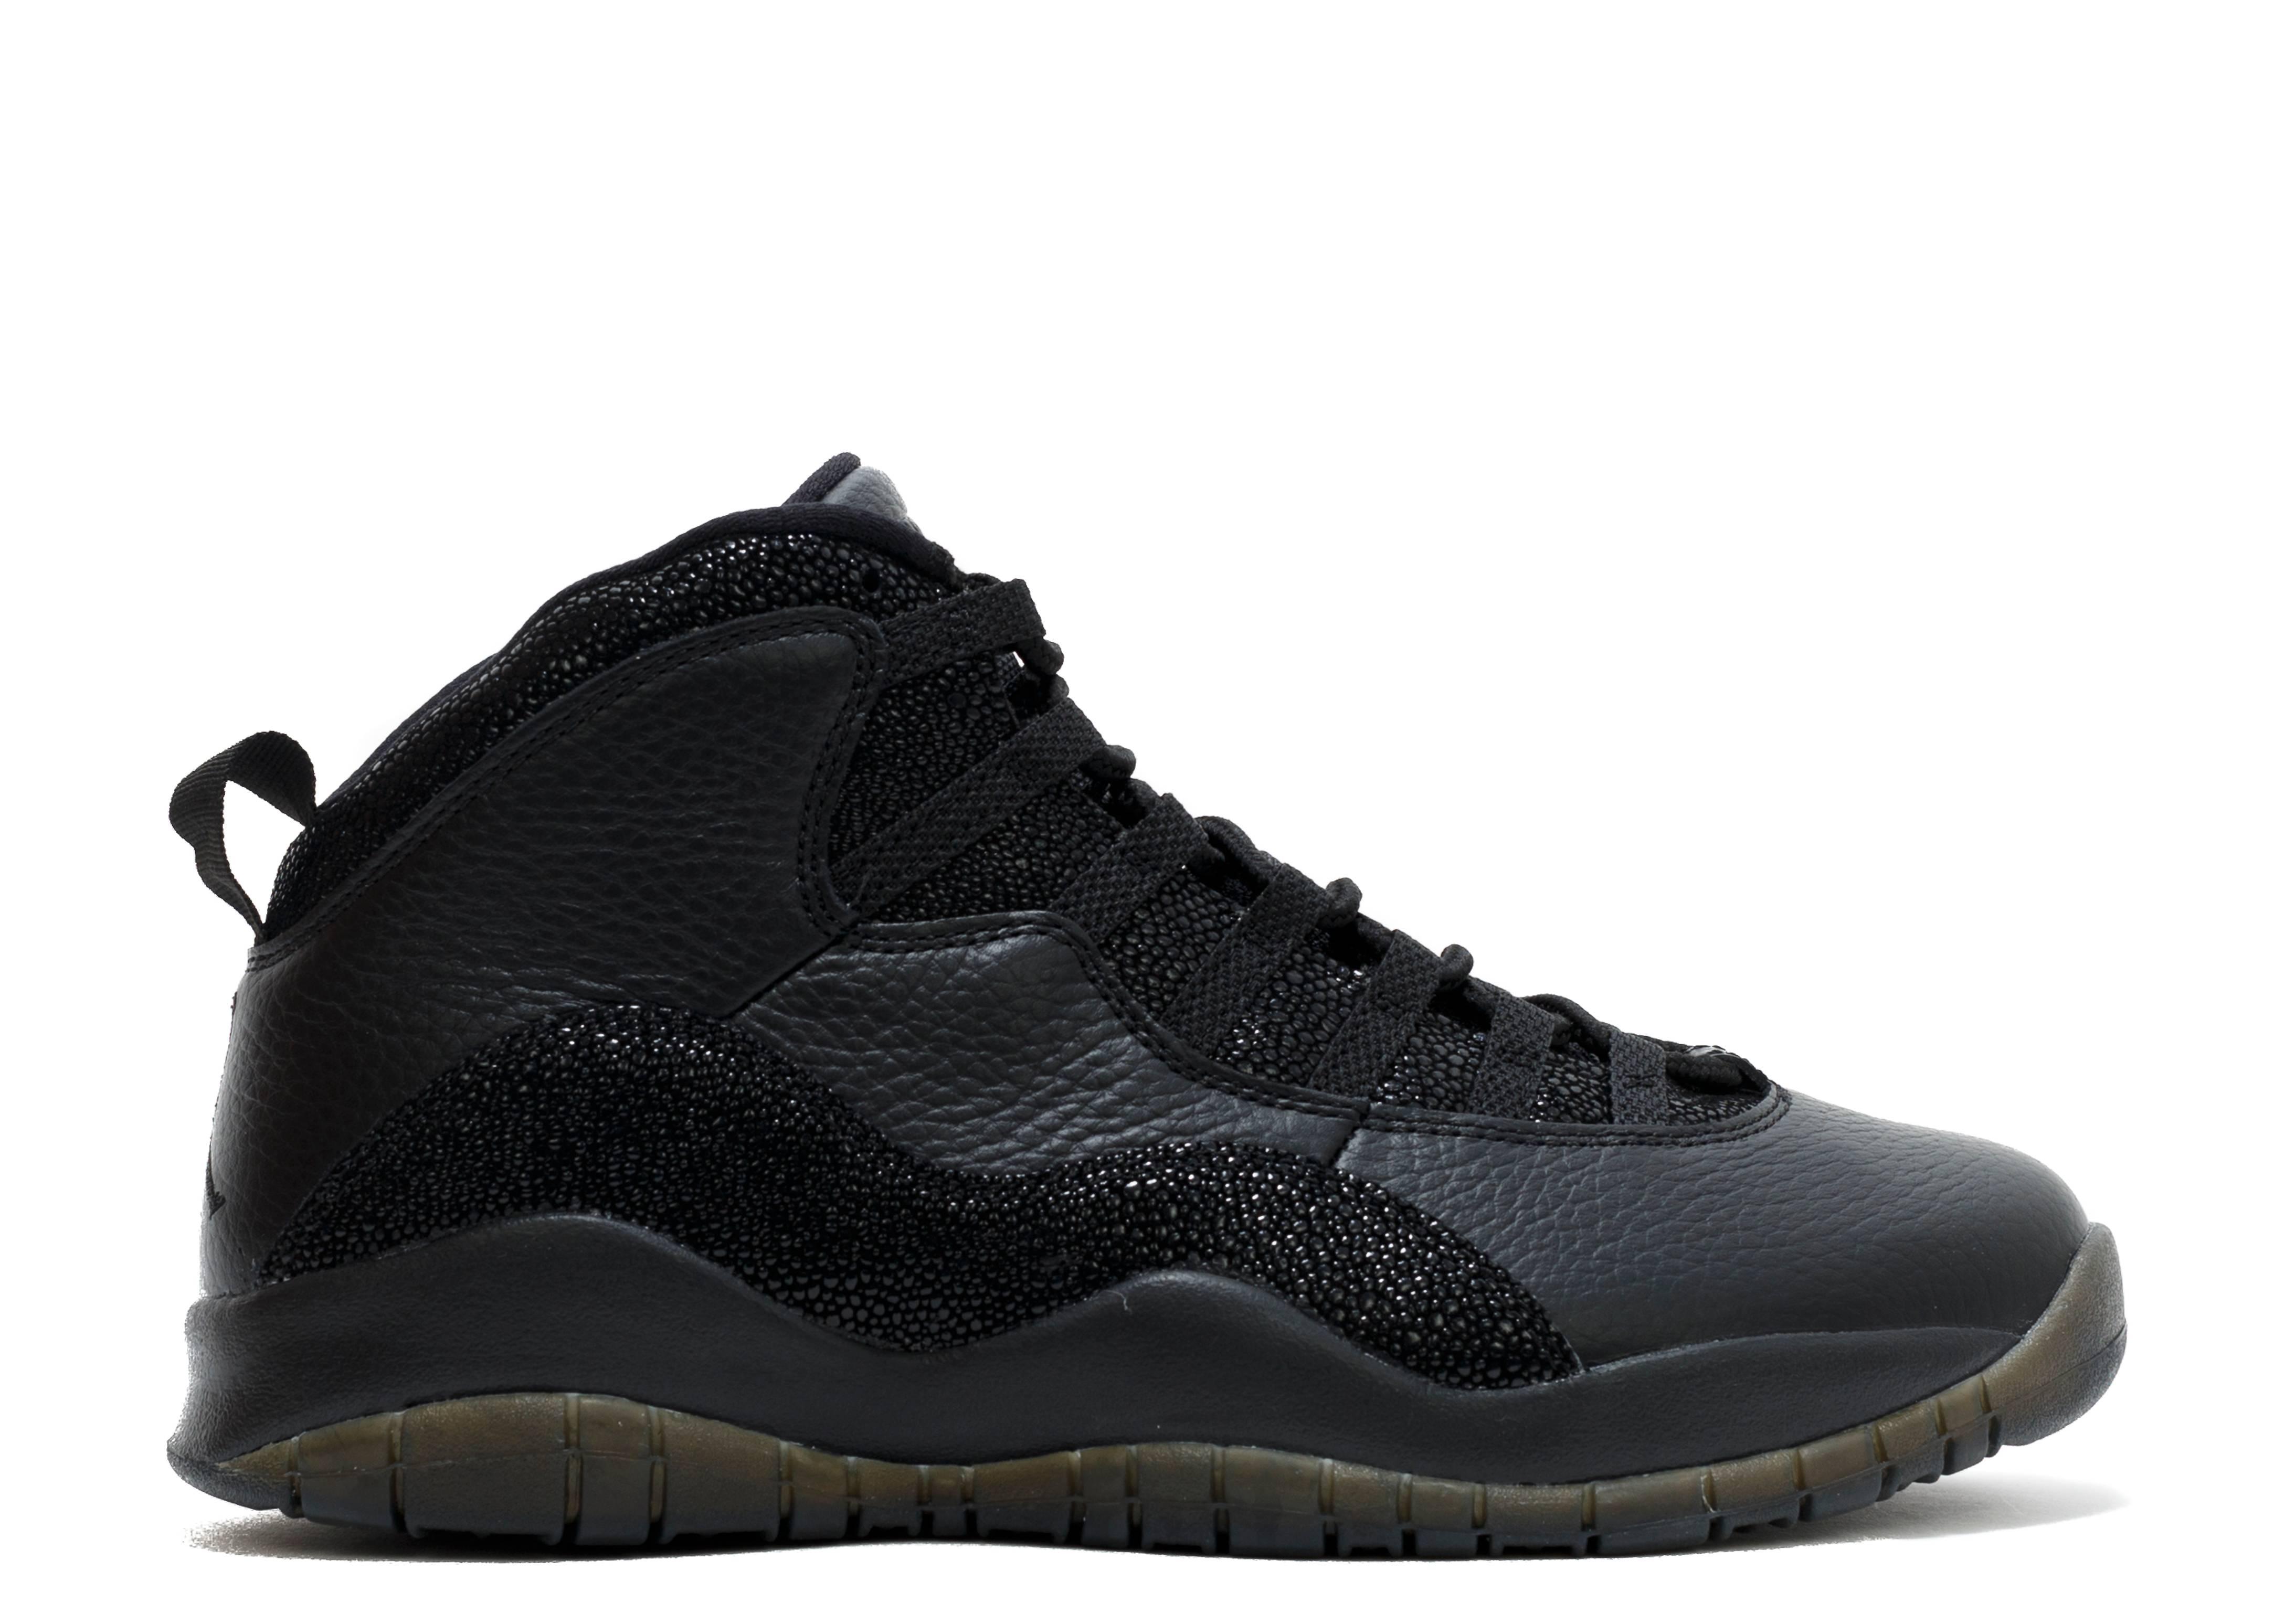 World's 10 Most Expensive Jordans